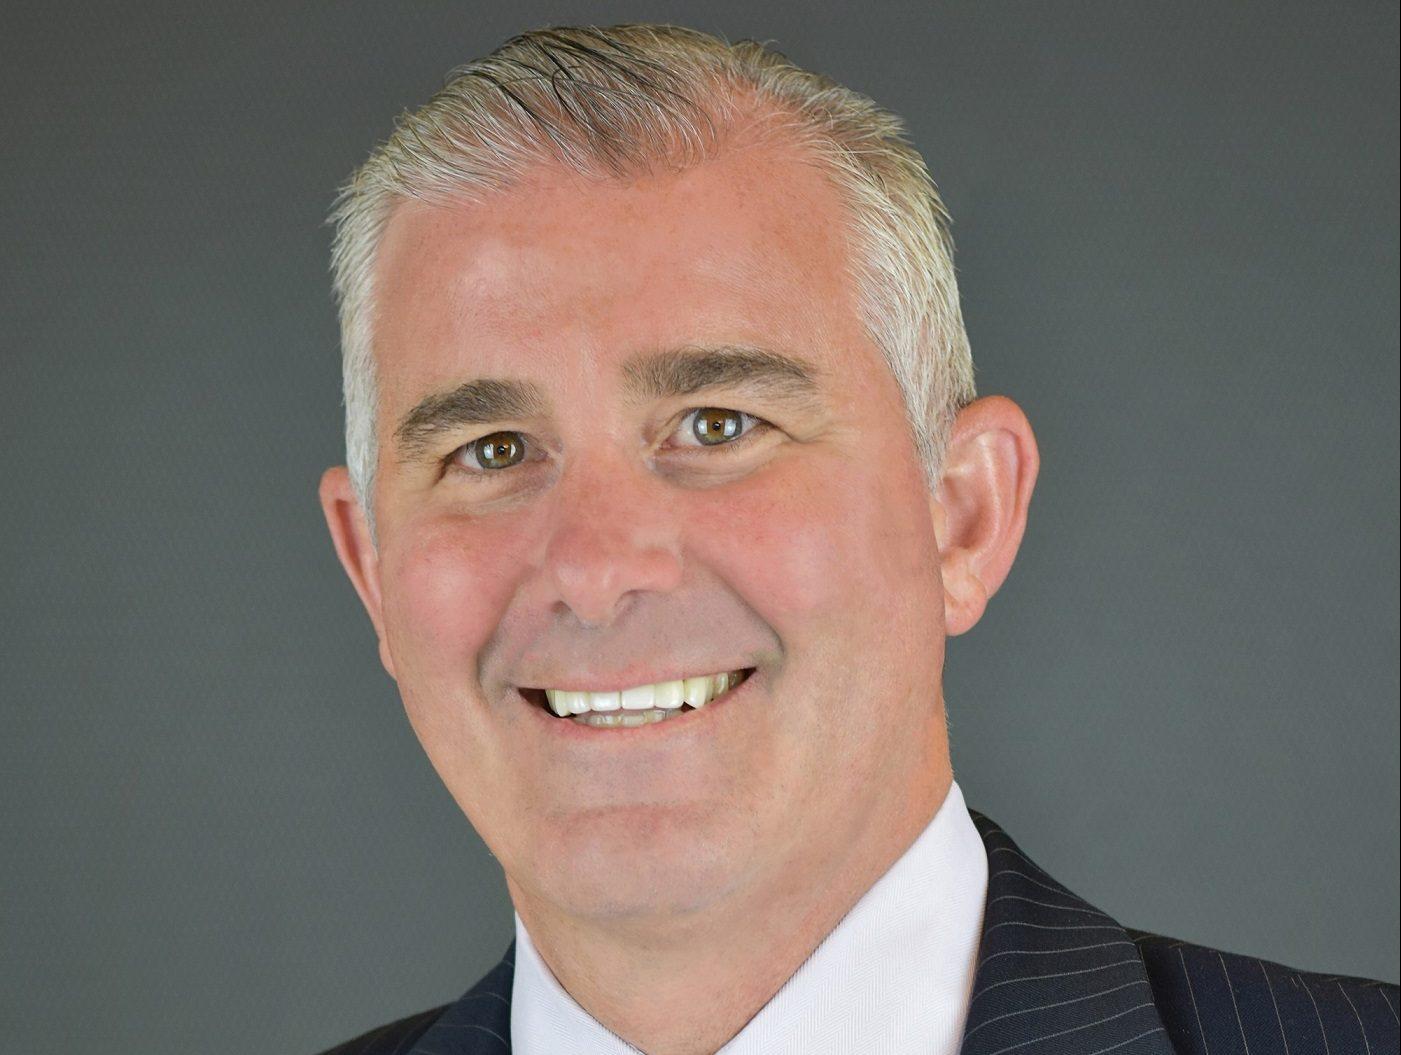 Ken Stern, first vice president, CBRE